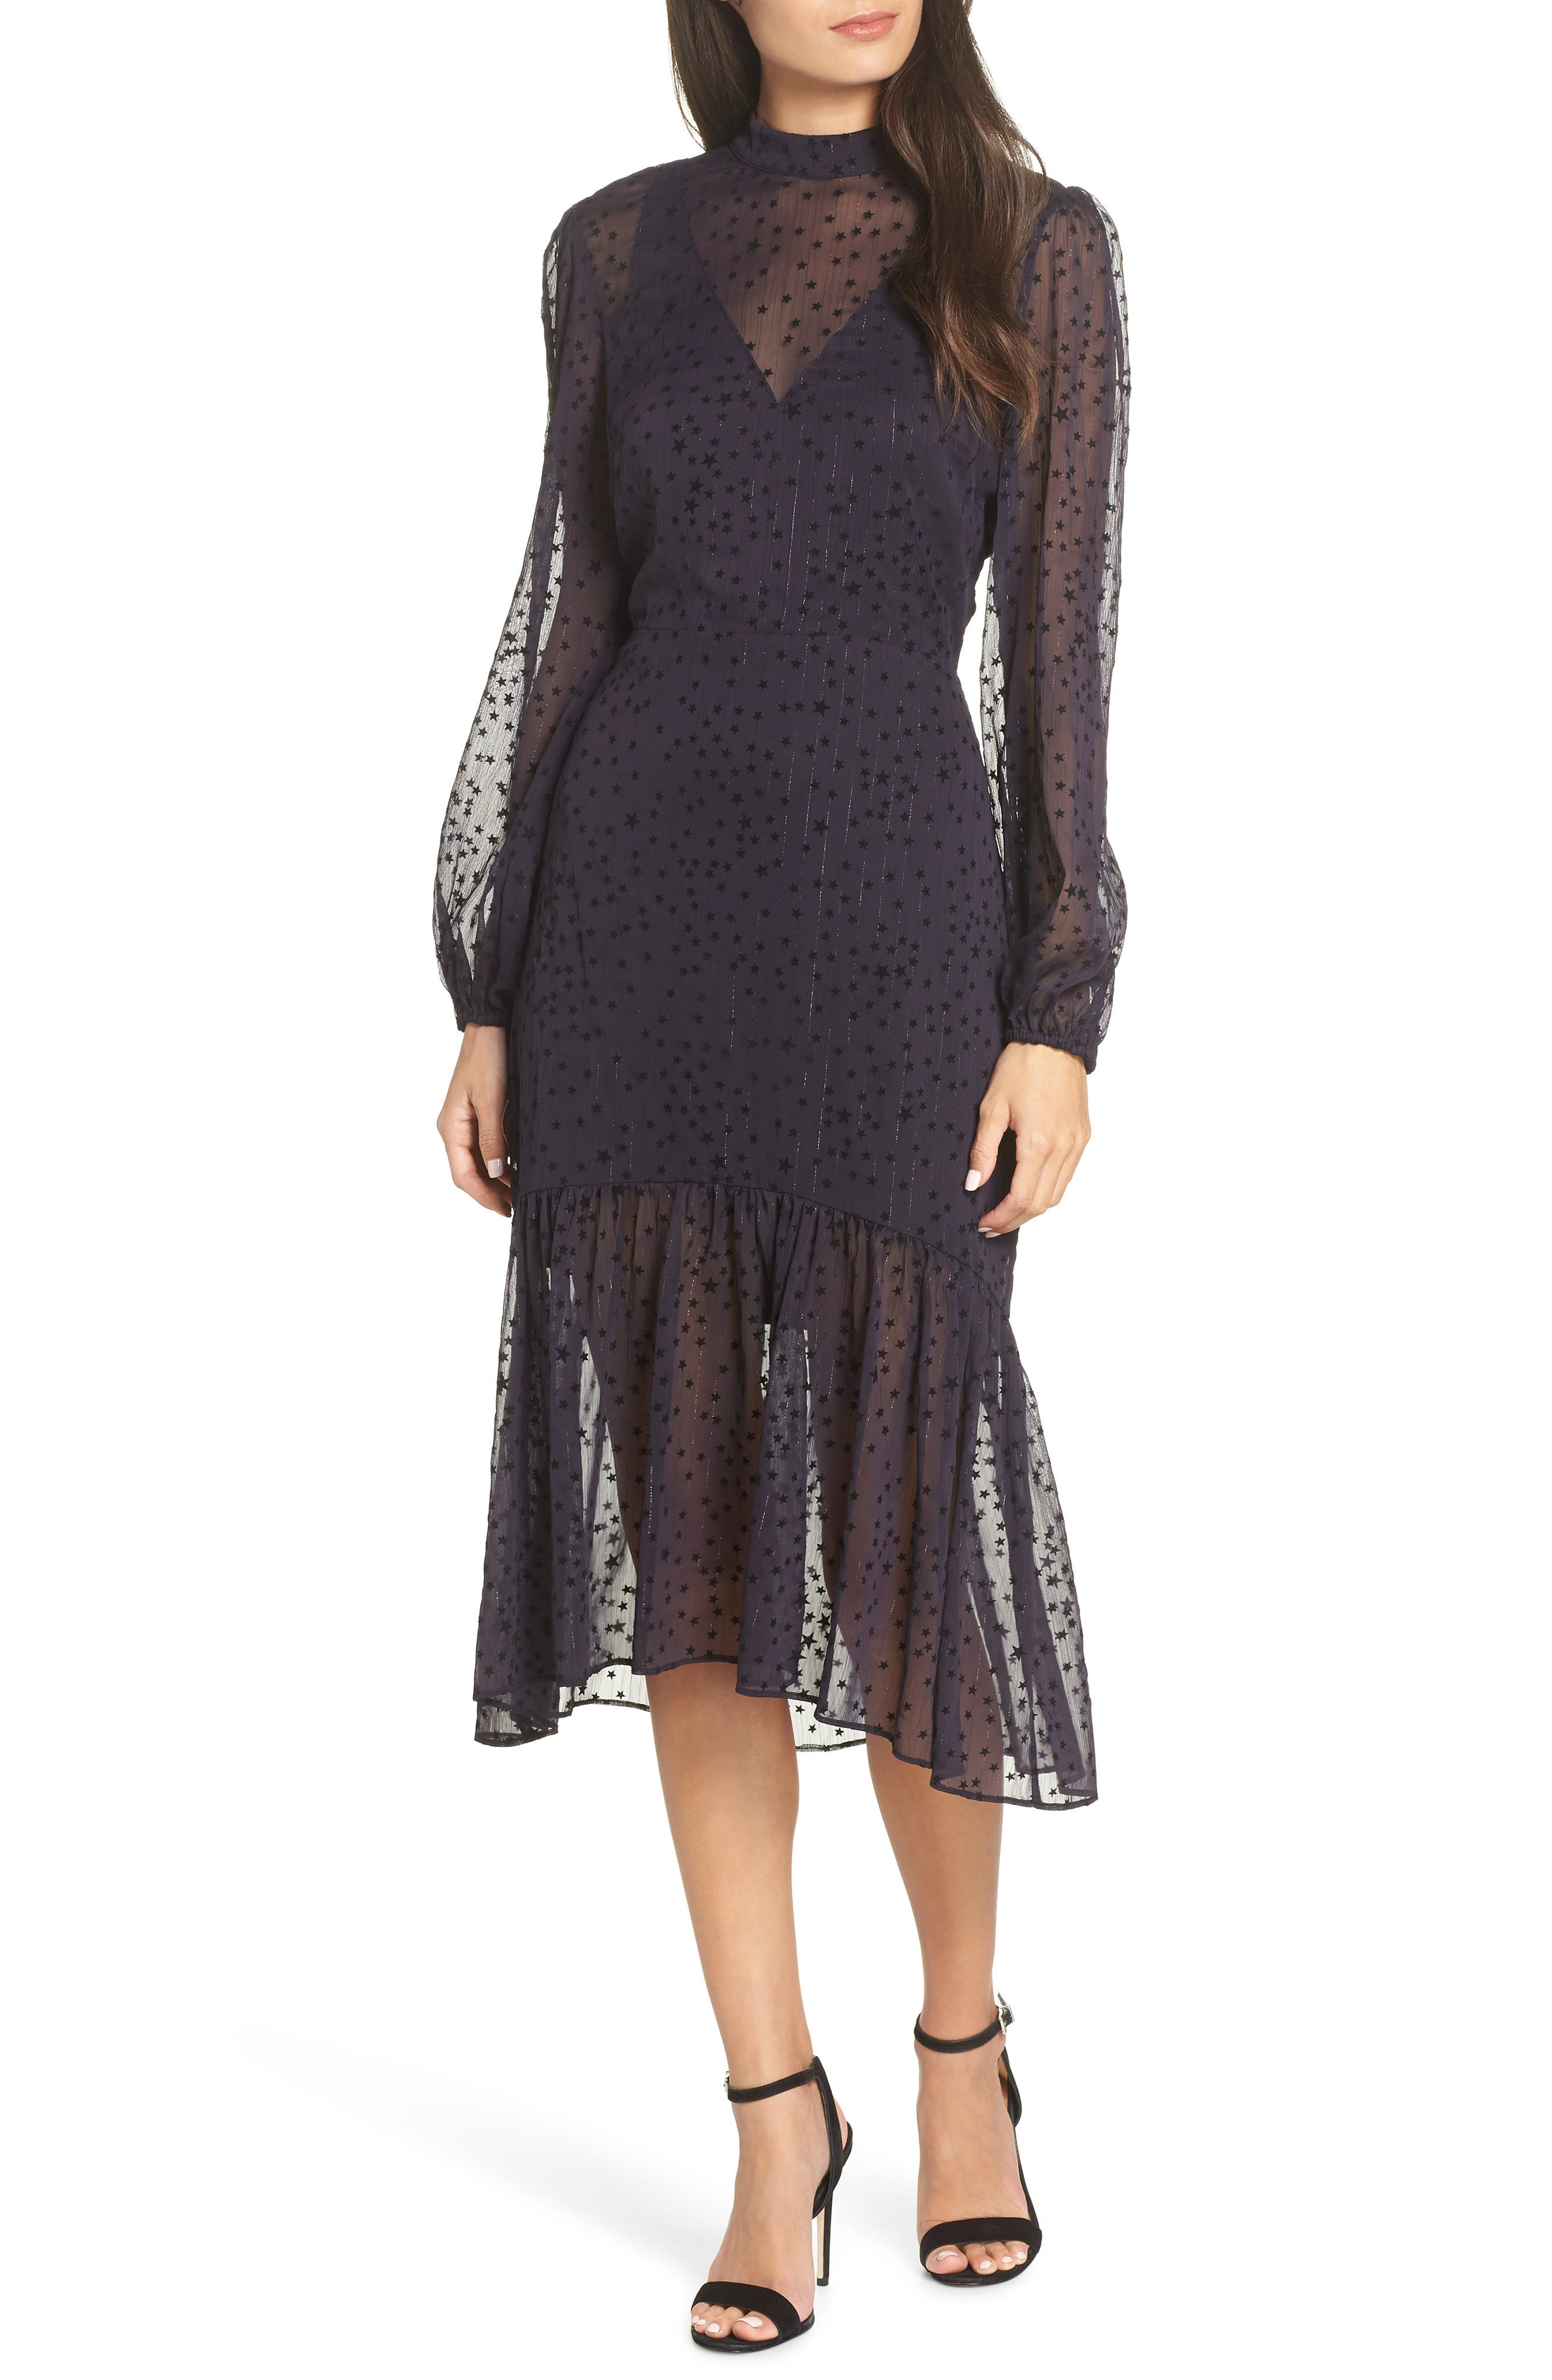 AVEC LES FILLES Flocked Star Ruffle Dress, Main, color, NAVY/ BLACK